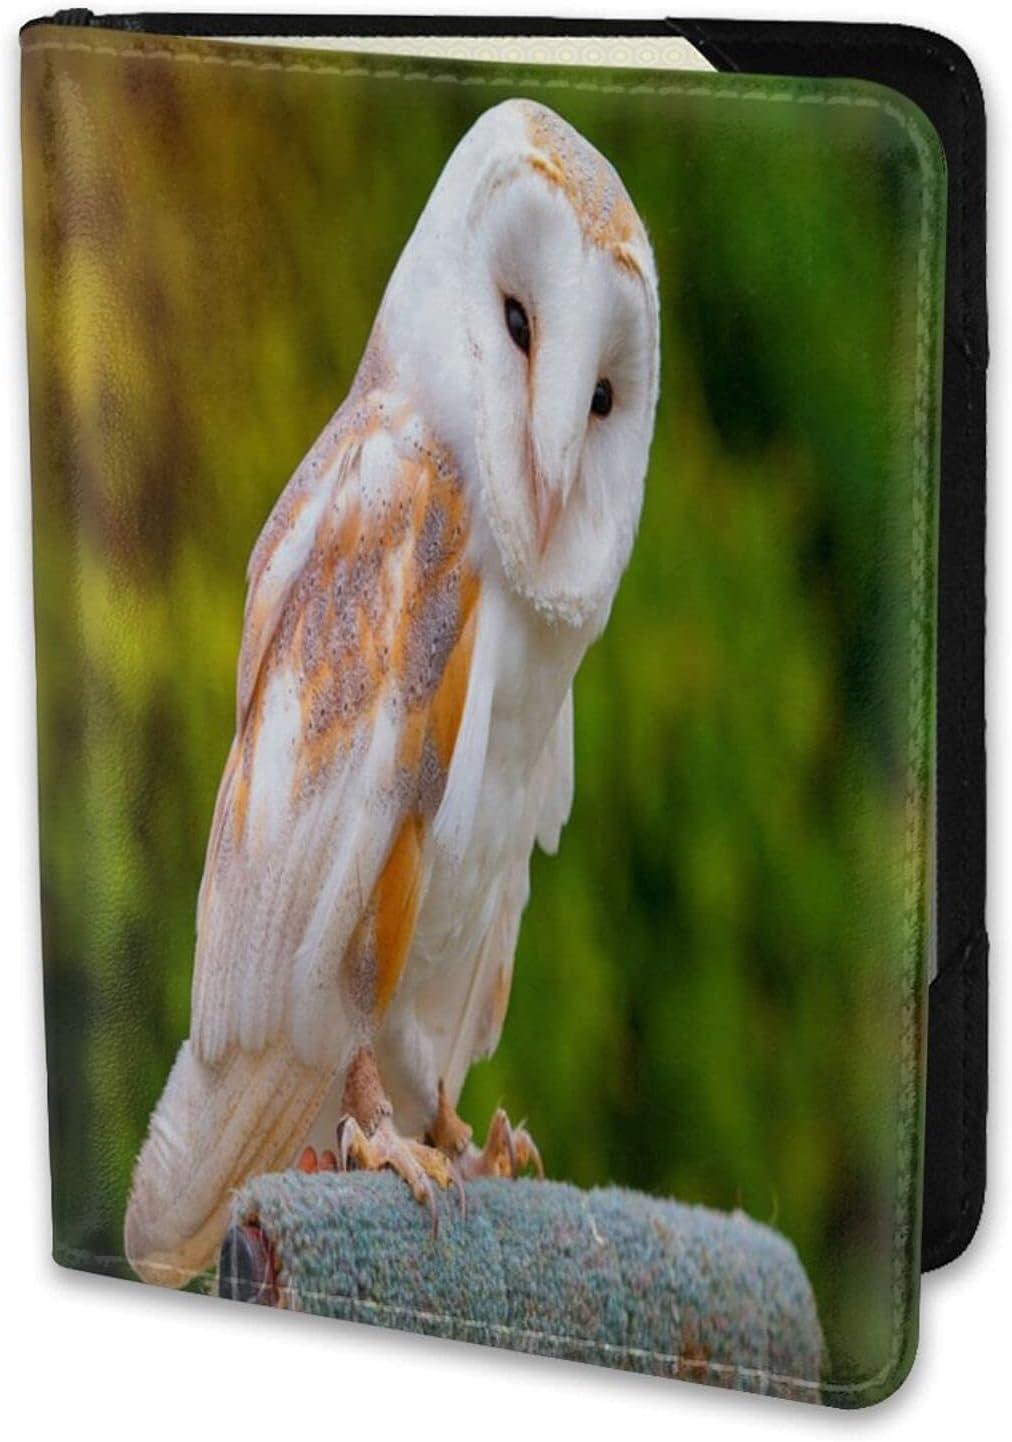 Outlet SALE Leather Travel Passport Barn Owl Holder Case Under blast sales E Card Wallet Cover